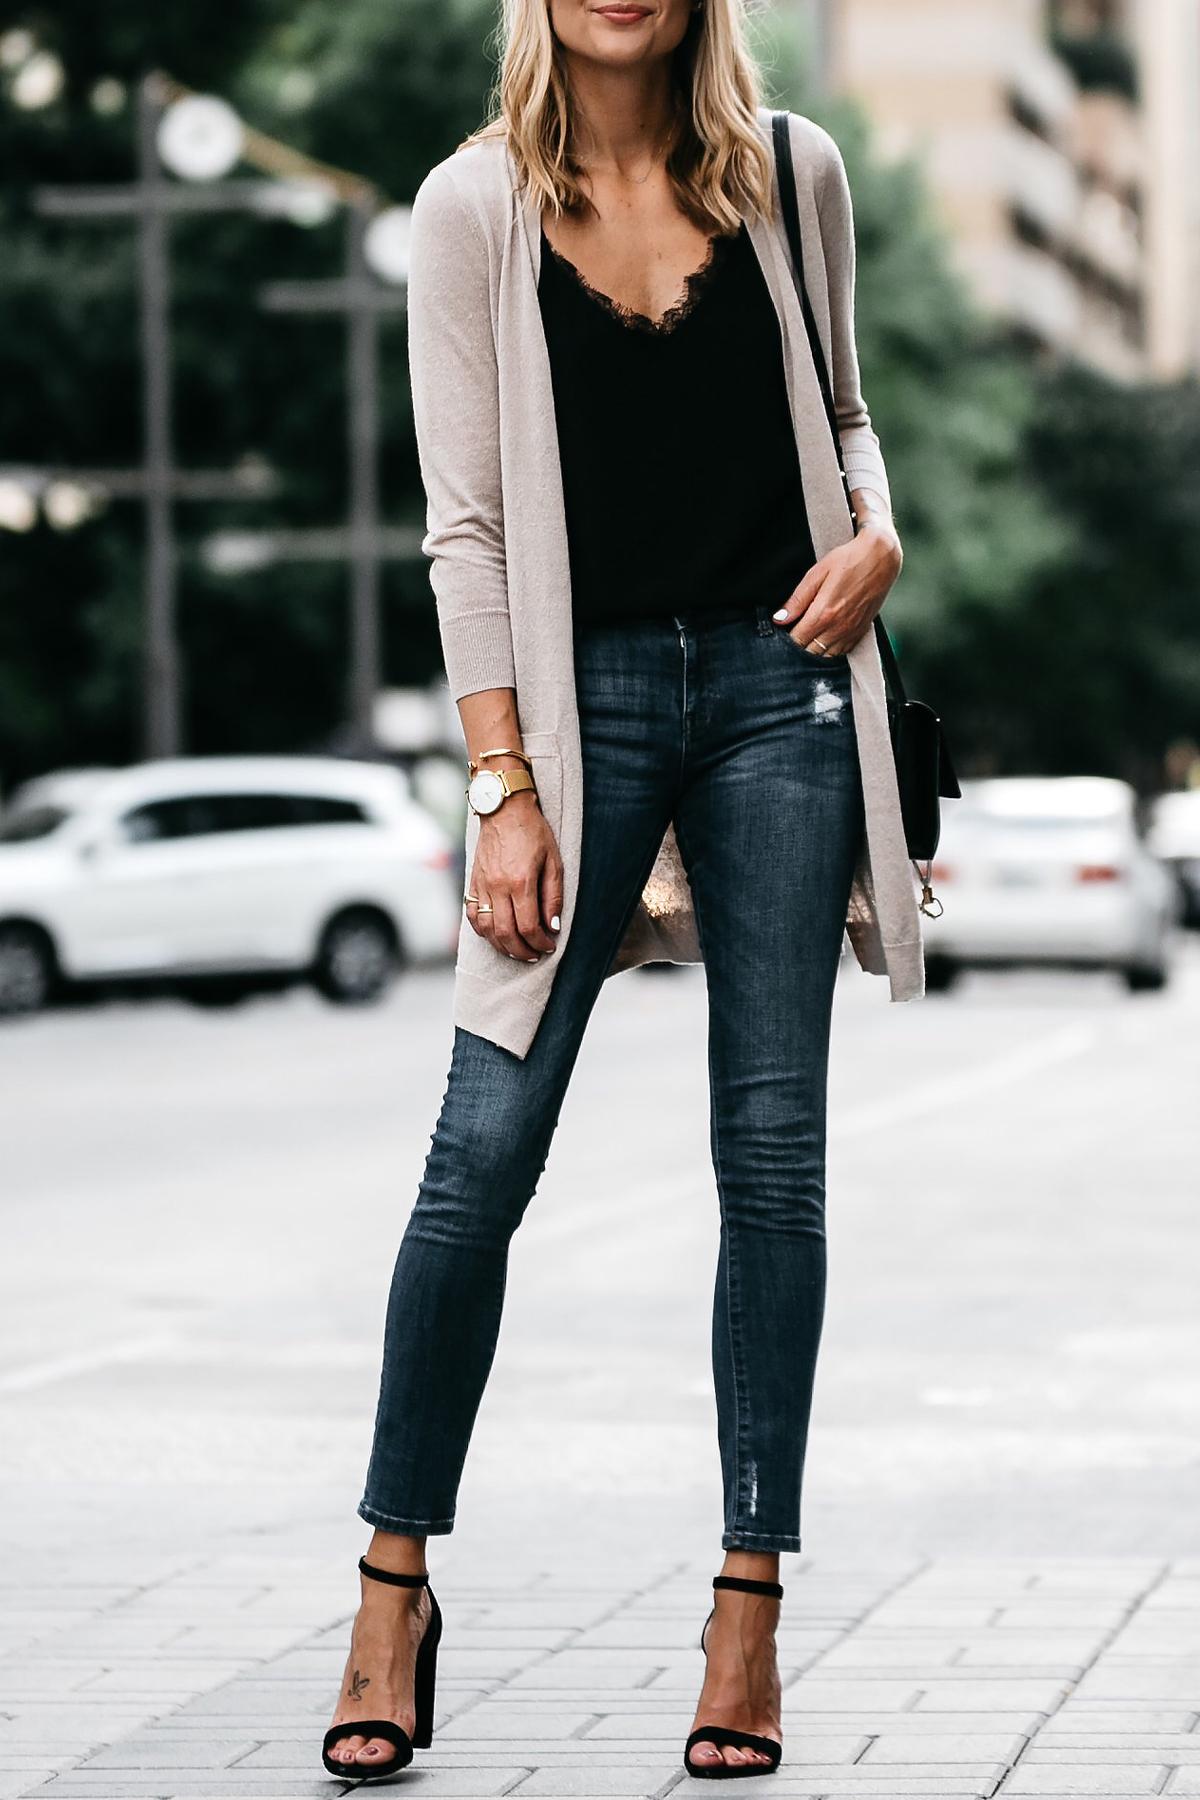 Long Tan Cardigan Black Lace Cami Denim Skinny Jeans Outfit Black Ankle Strap Heeled Sandals Fashion Jackson Dallas Blogger Fashion Blogger